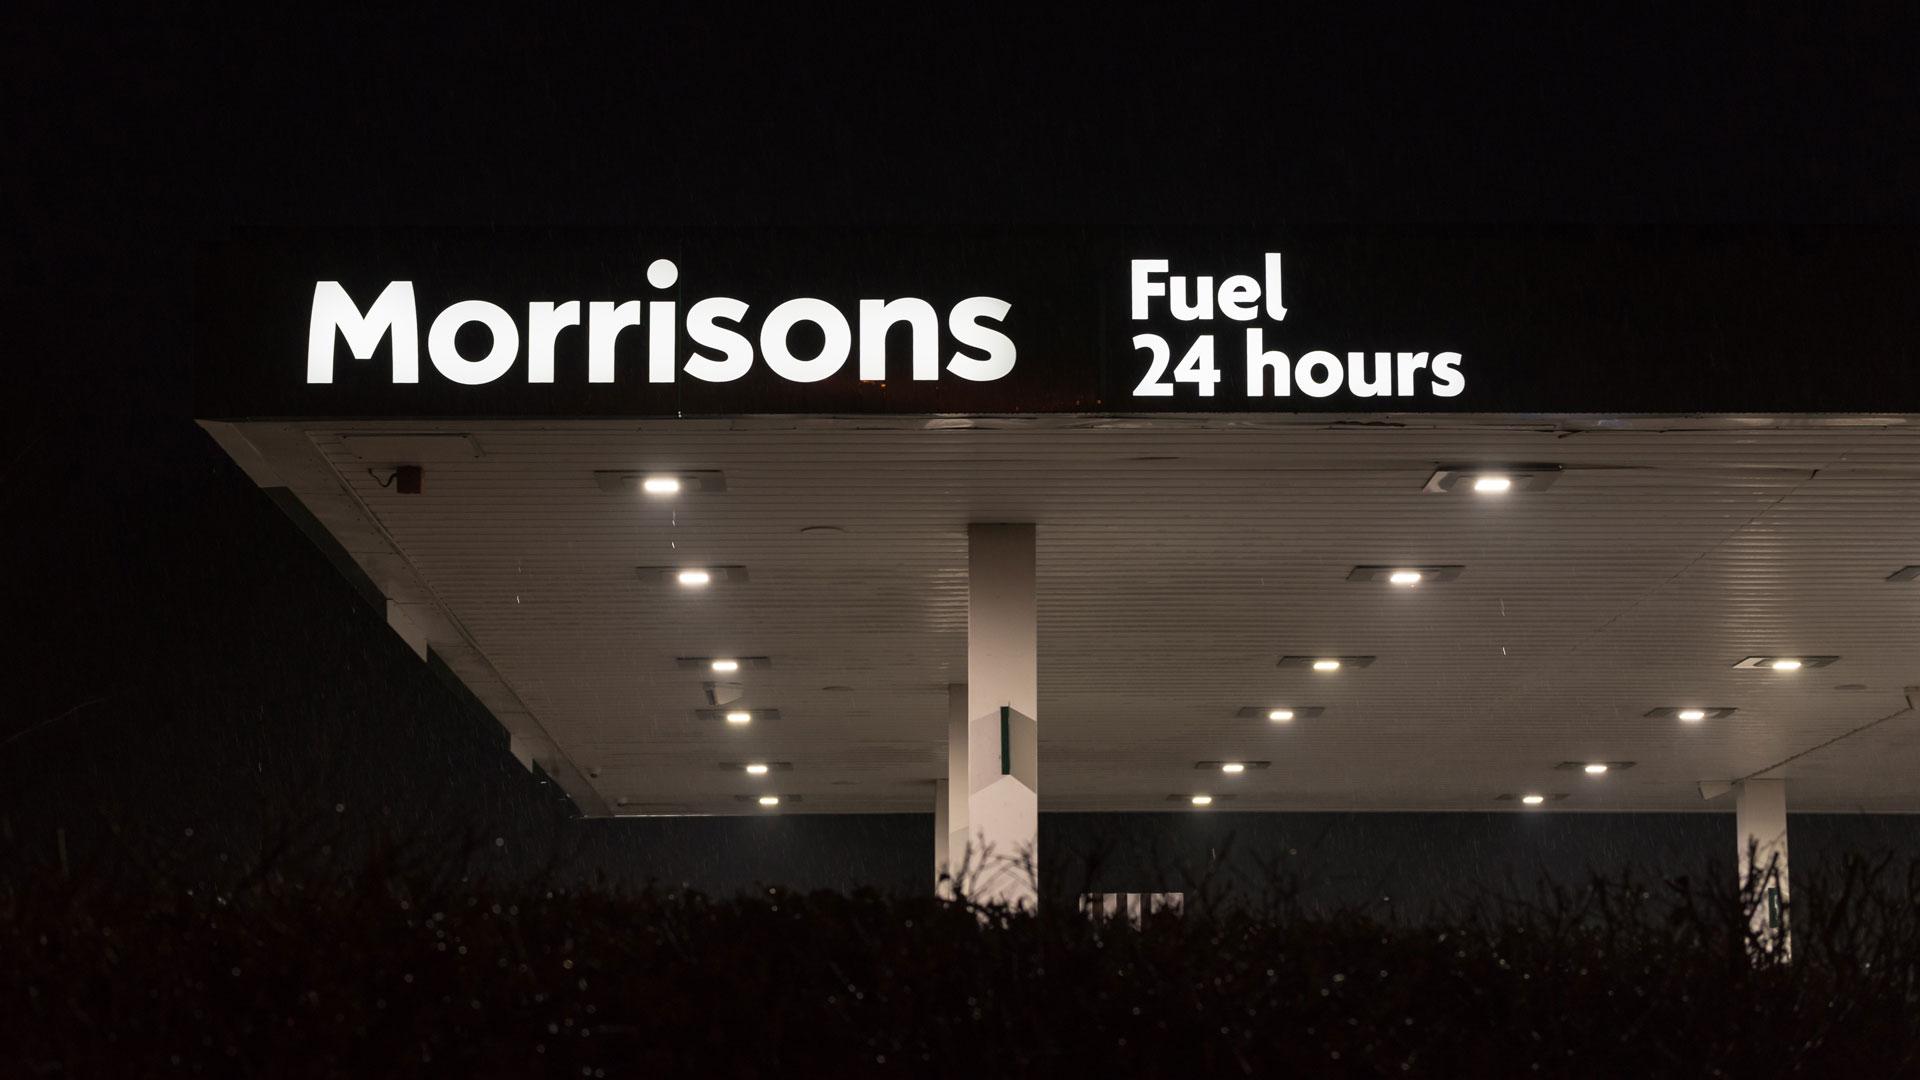 Morrisons Fuel 24 Hours